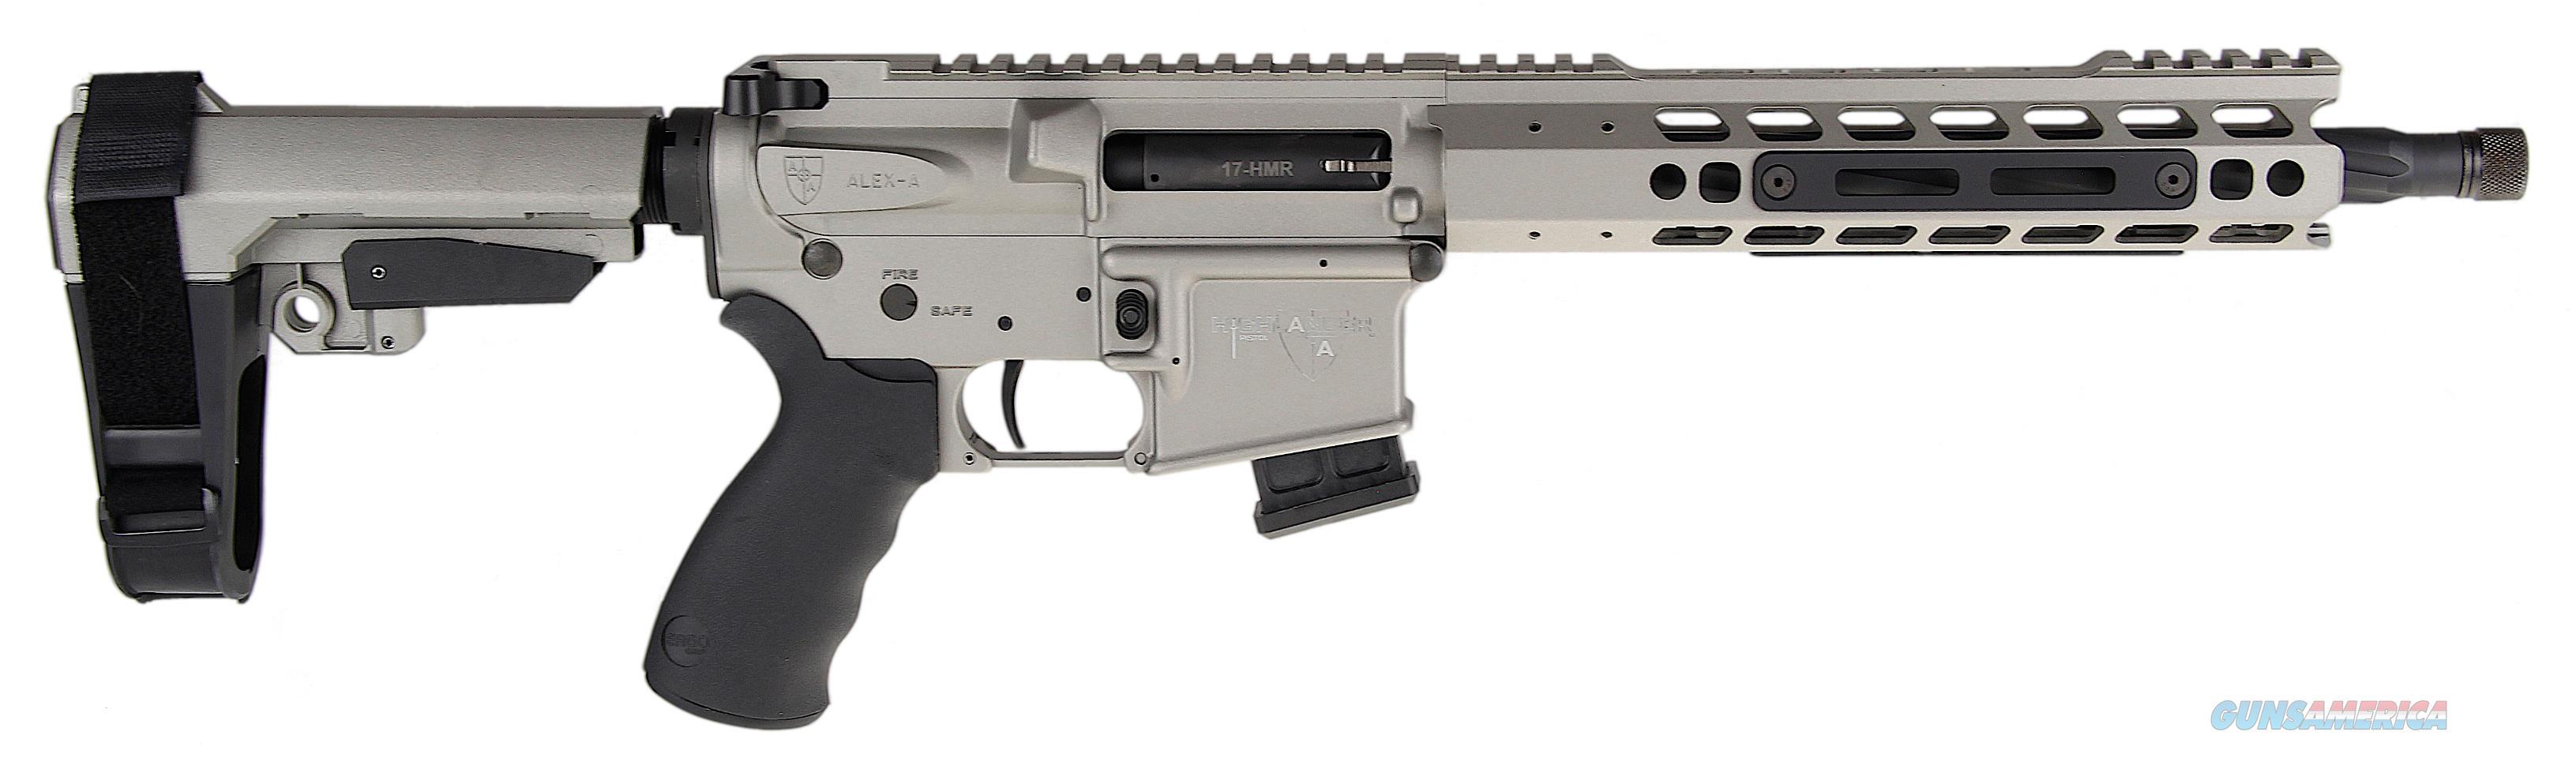 Alexander Arms Highlander, Alex Phi17sgve   Highlander Pistol 17hmr Grey  Guns > Pistols > 1911 Pistol Copies (non-Colt)